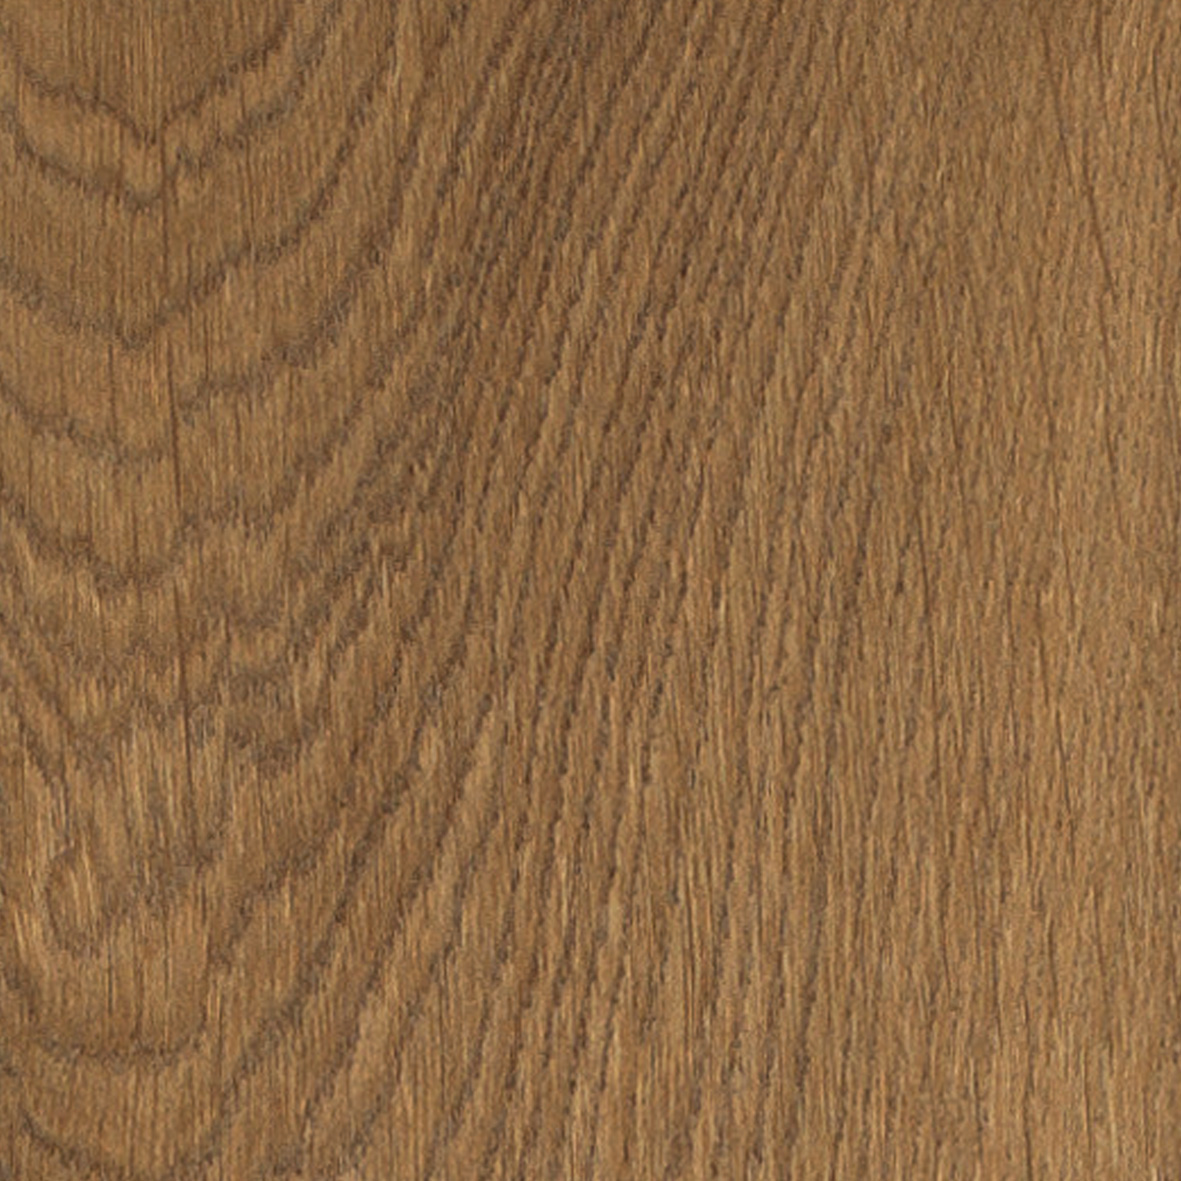 Teinter un parquet elegant luimage en grand with teinter un parquet stunning luimage en grand - Teinter du cuir ...